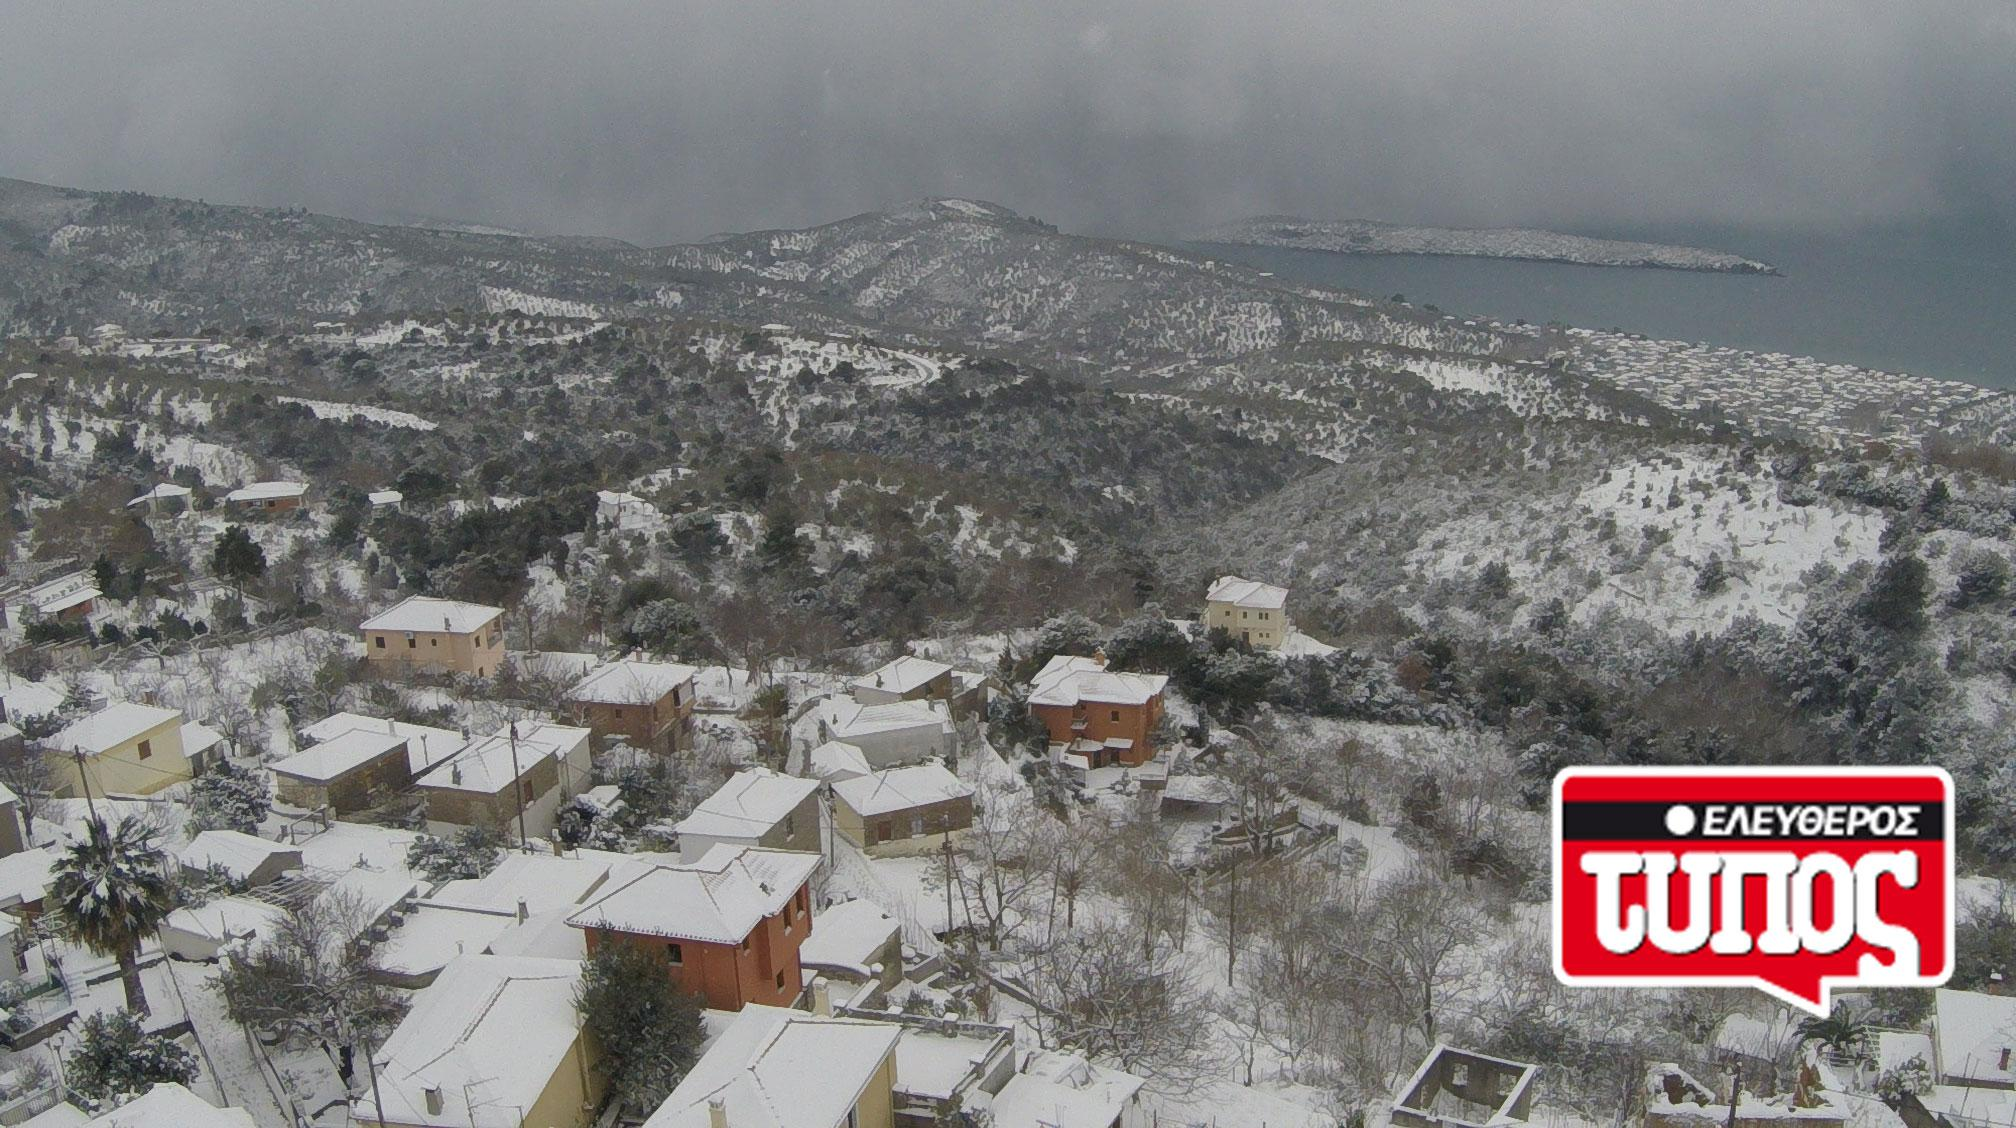 laukos-piliou-xionismenos-aerofotografies-1300-1 Εντυπωσιακές αεροφωτογραφίες από το χιονισμένο Λαύκο Πηλίου [εικόνες]